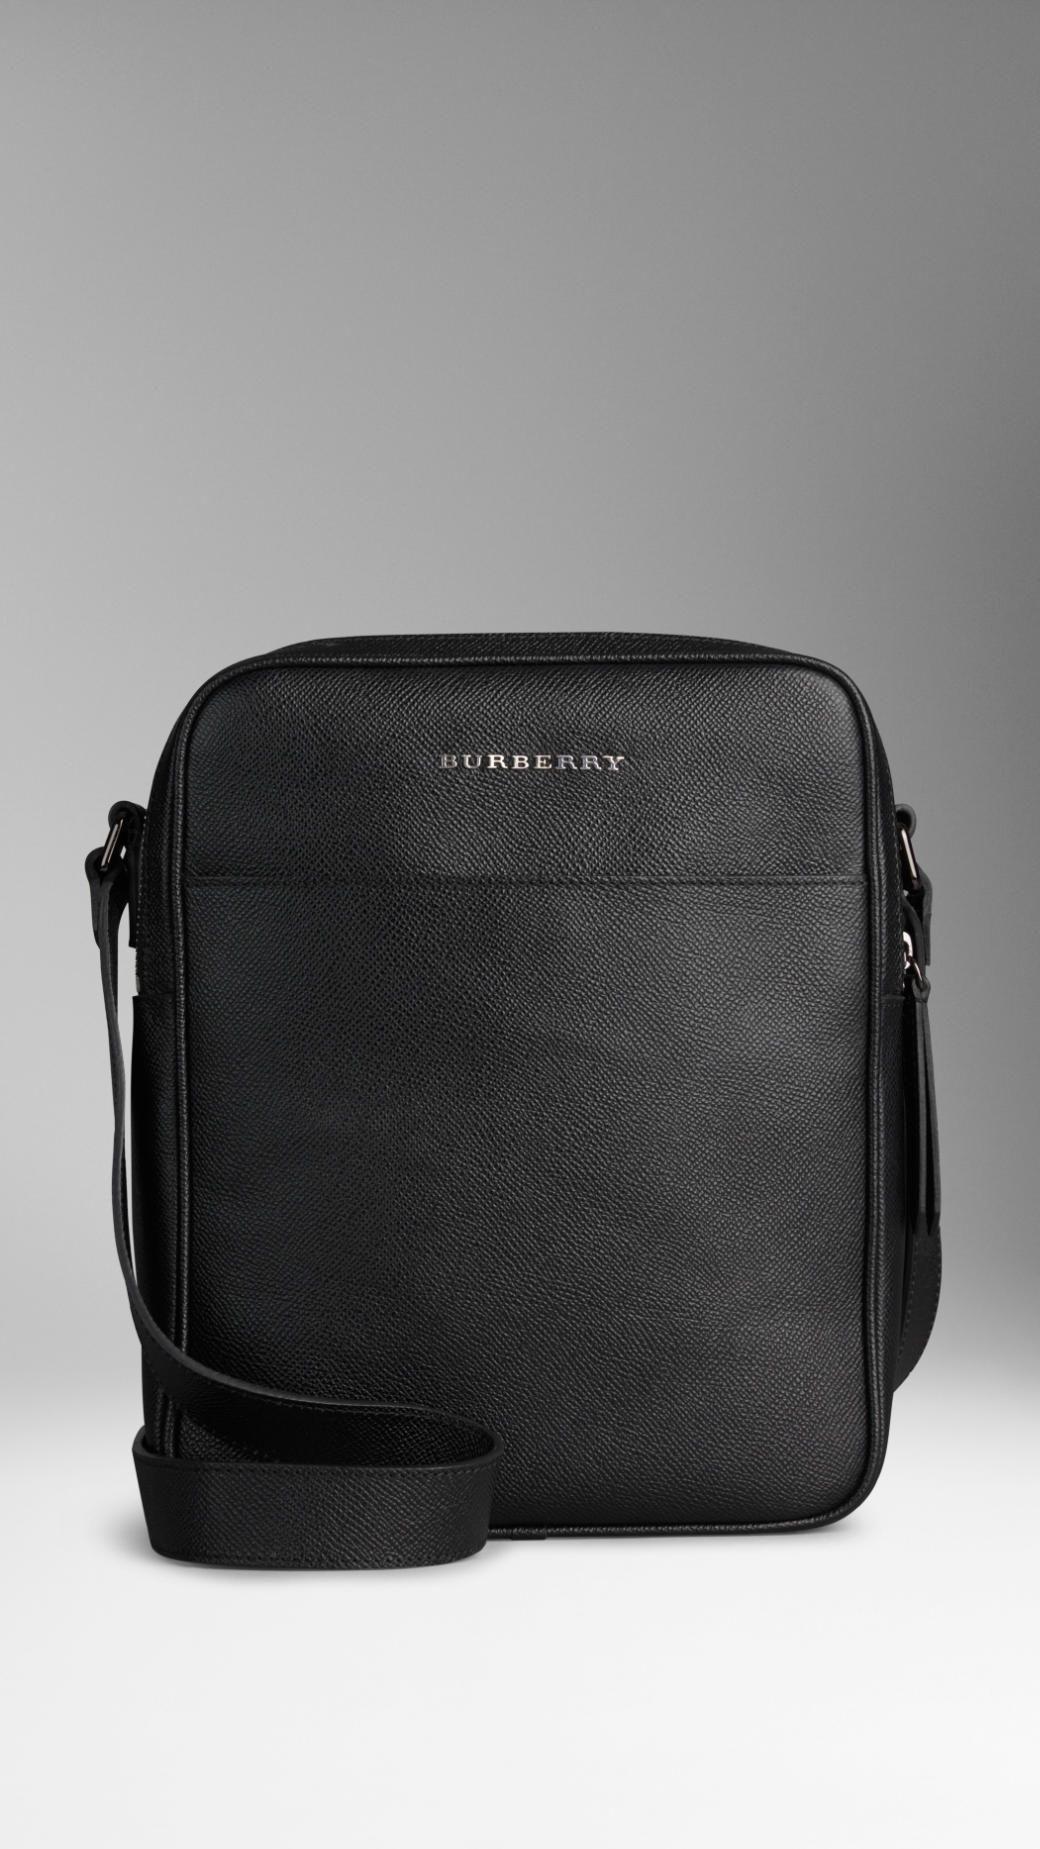 More Diseño BagsDuffle Men's BagsBriefcasesToteamp; En n0O8wPkX